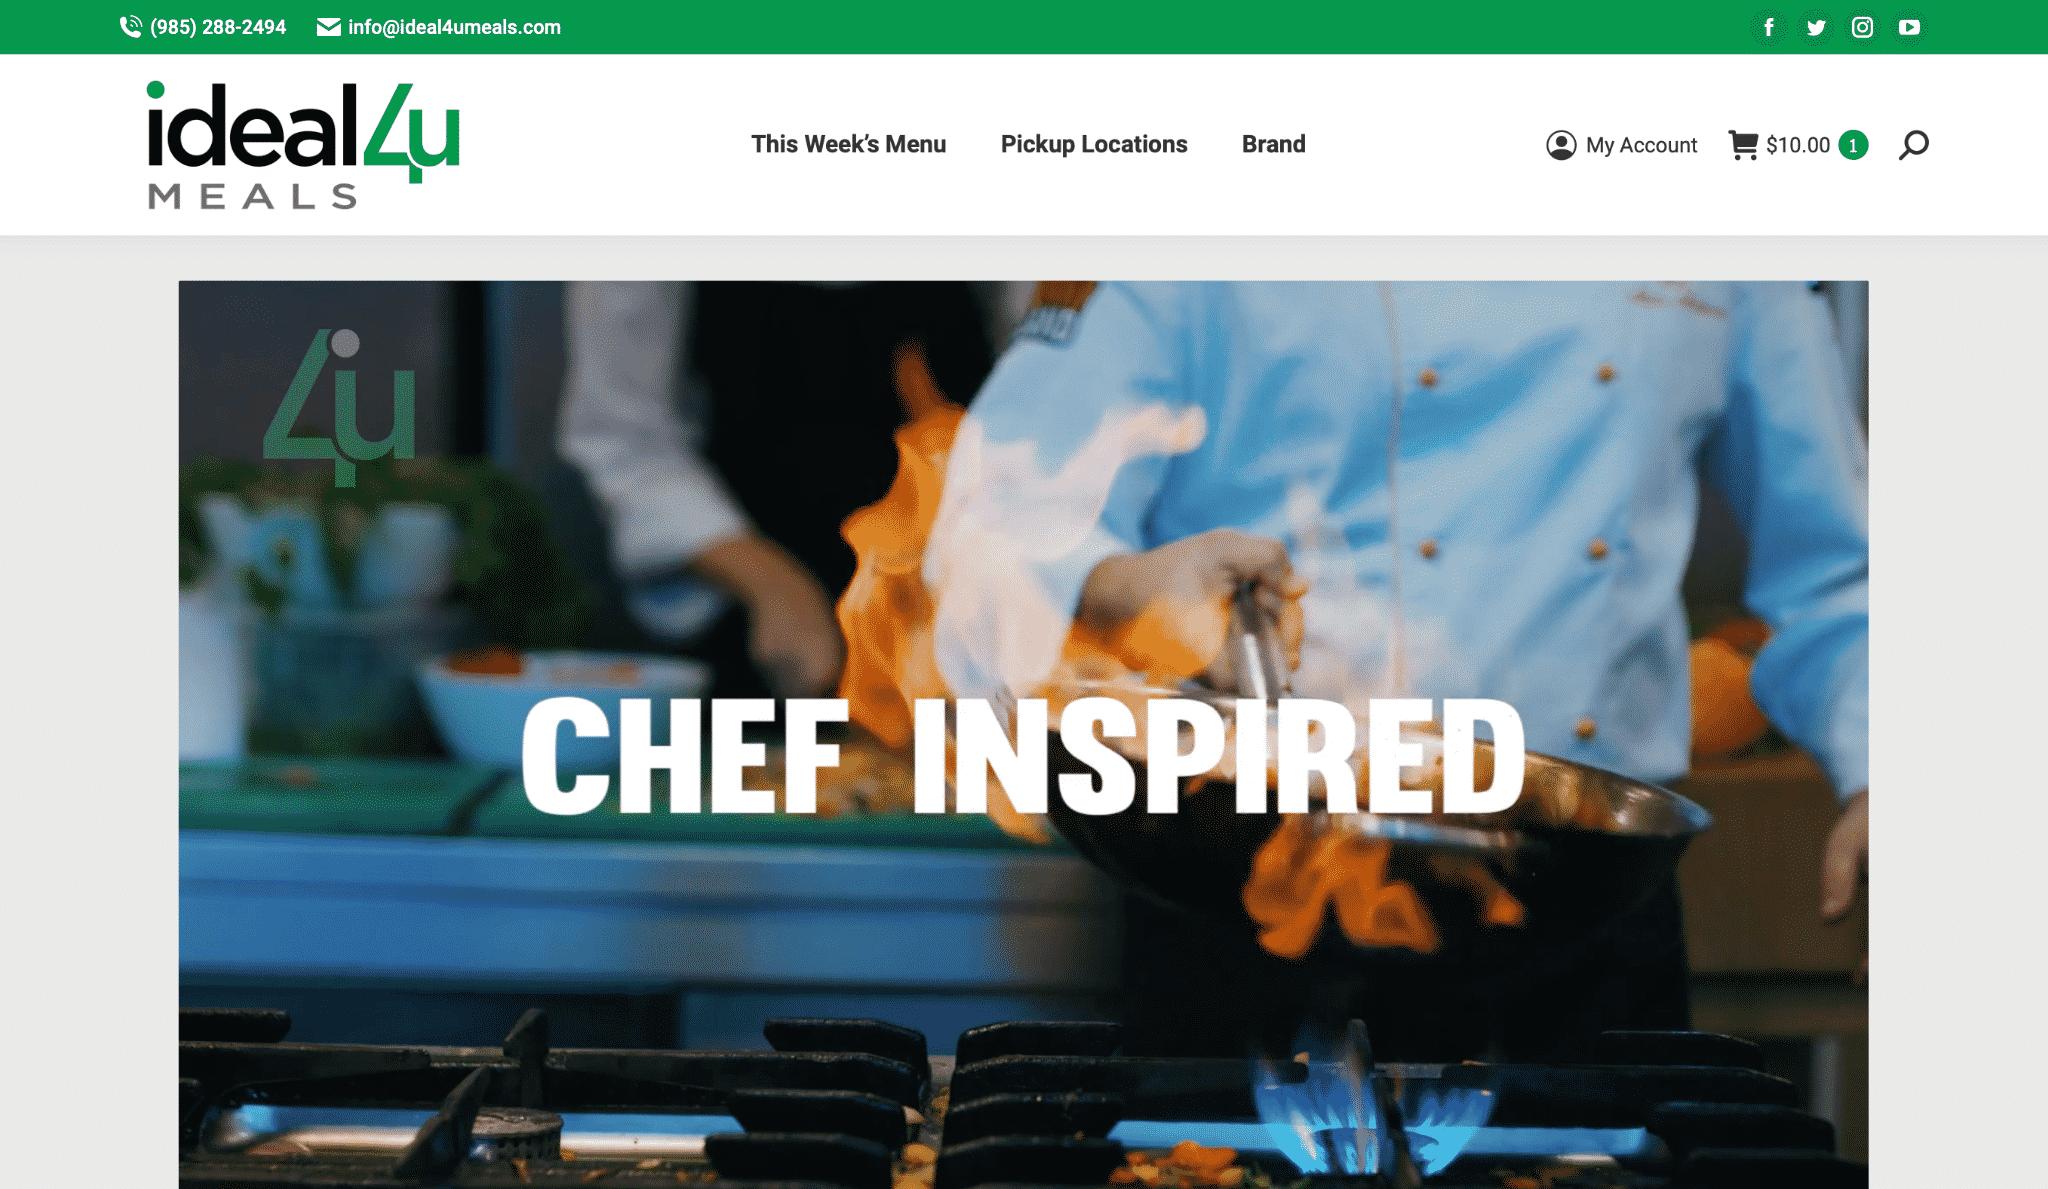 BaseLynk Ideal4UMeals Homepage